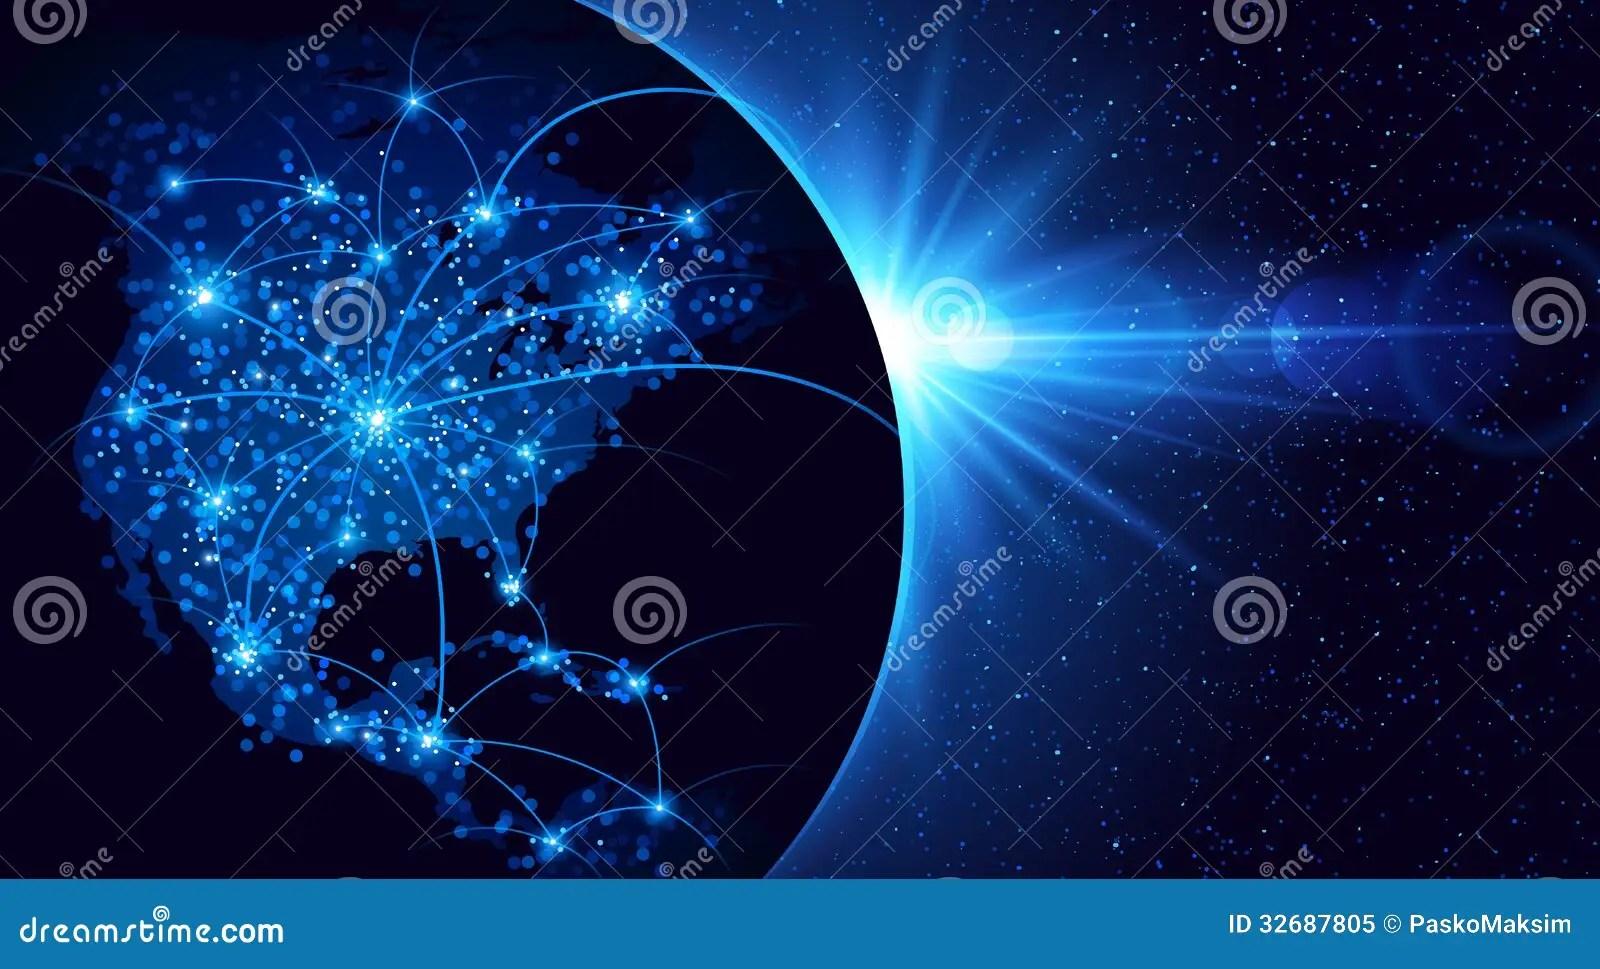 Night View Hd Wallpaper Global Communication Royalty Free Stock Photo Image